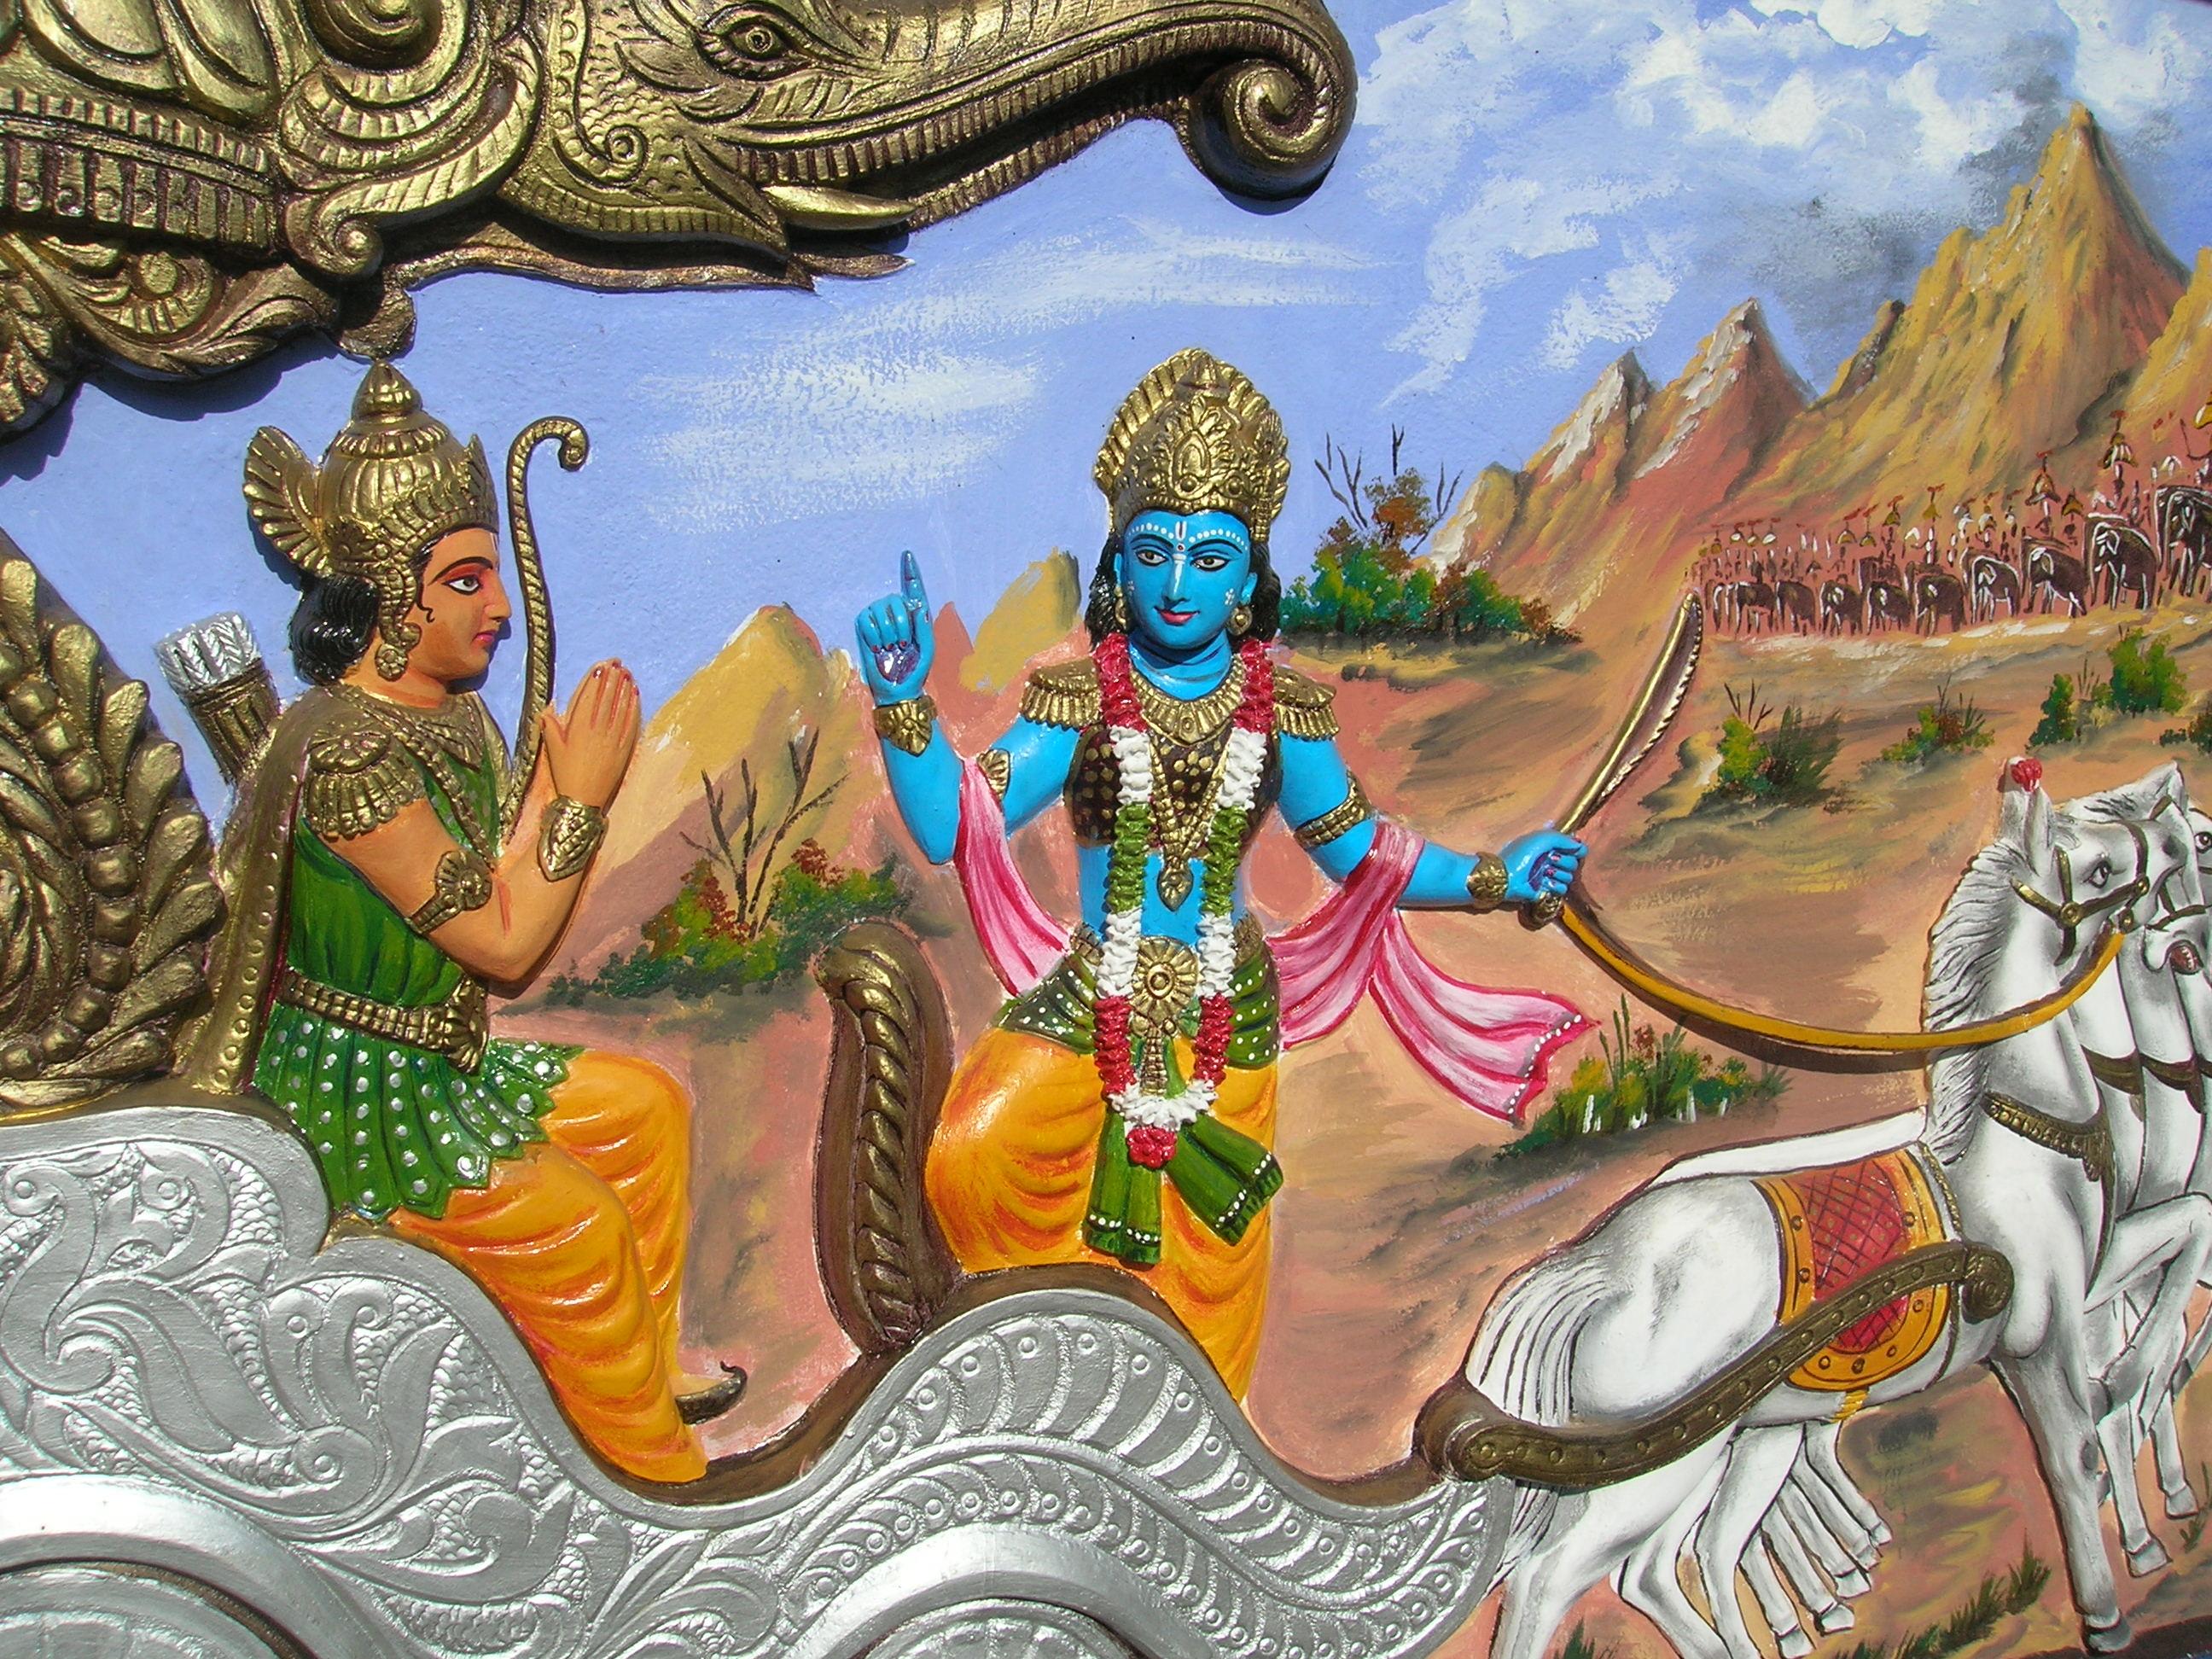 krishna arjun साठी इमेज परिणाम